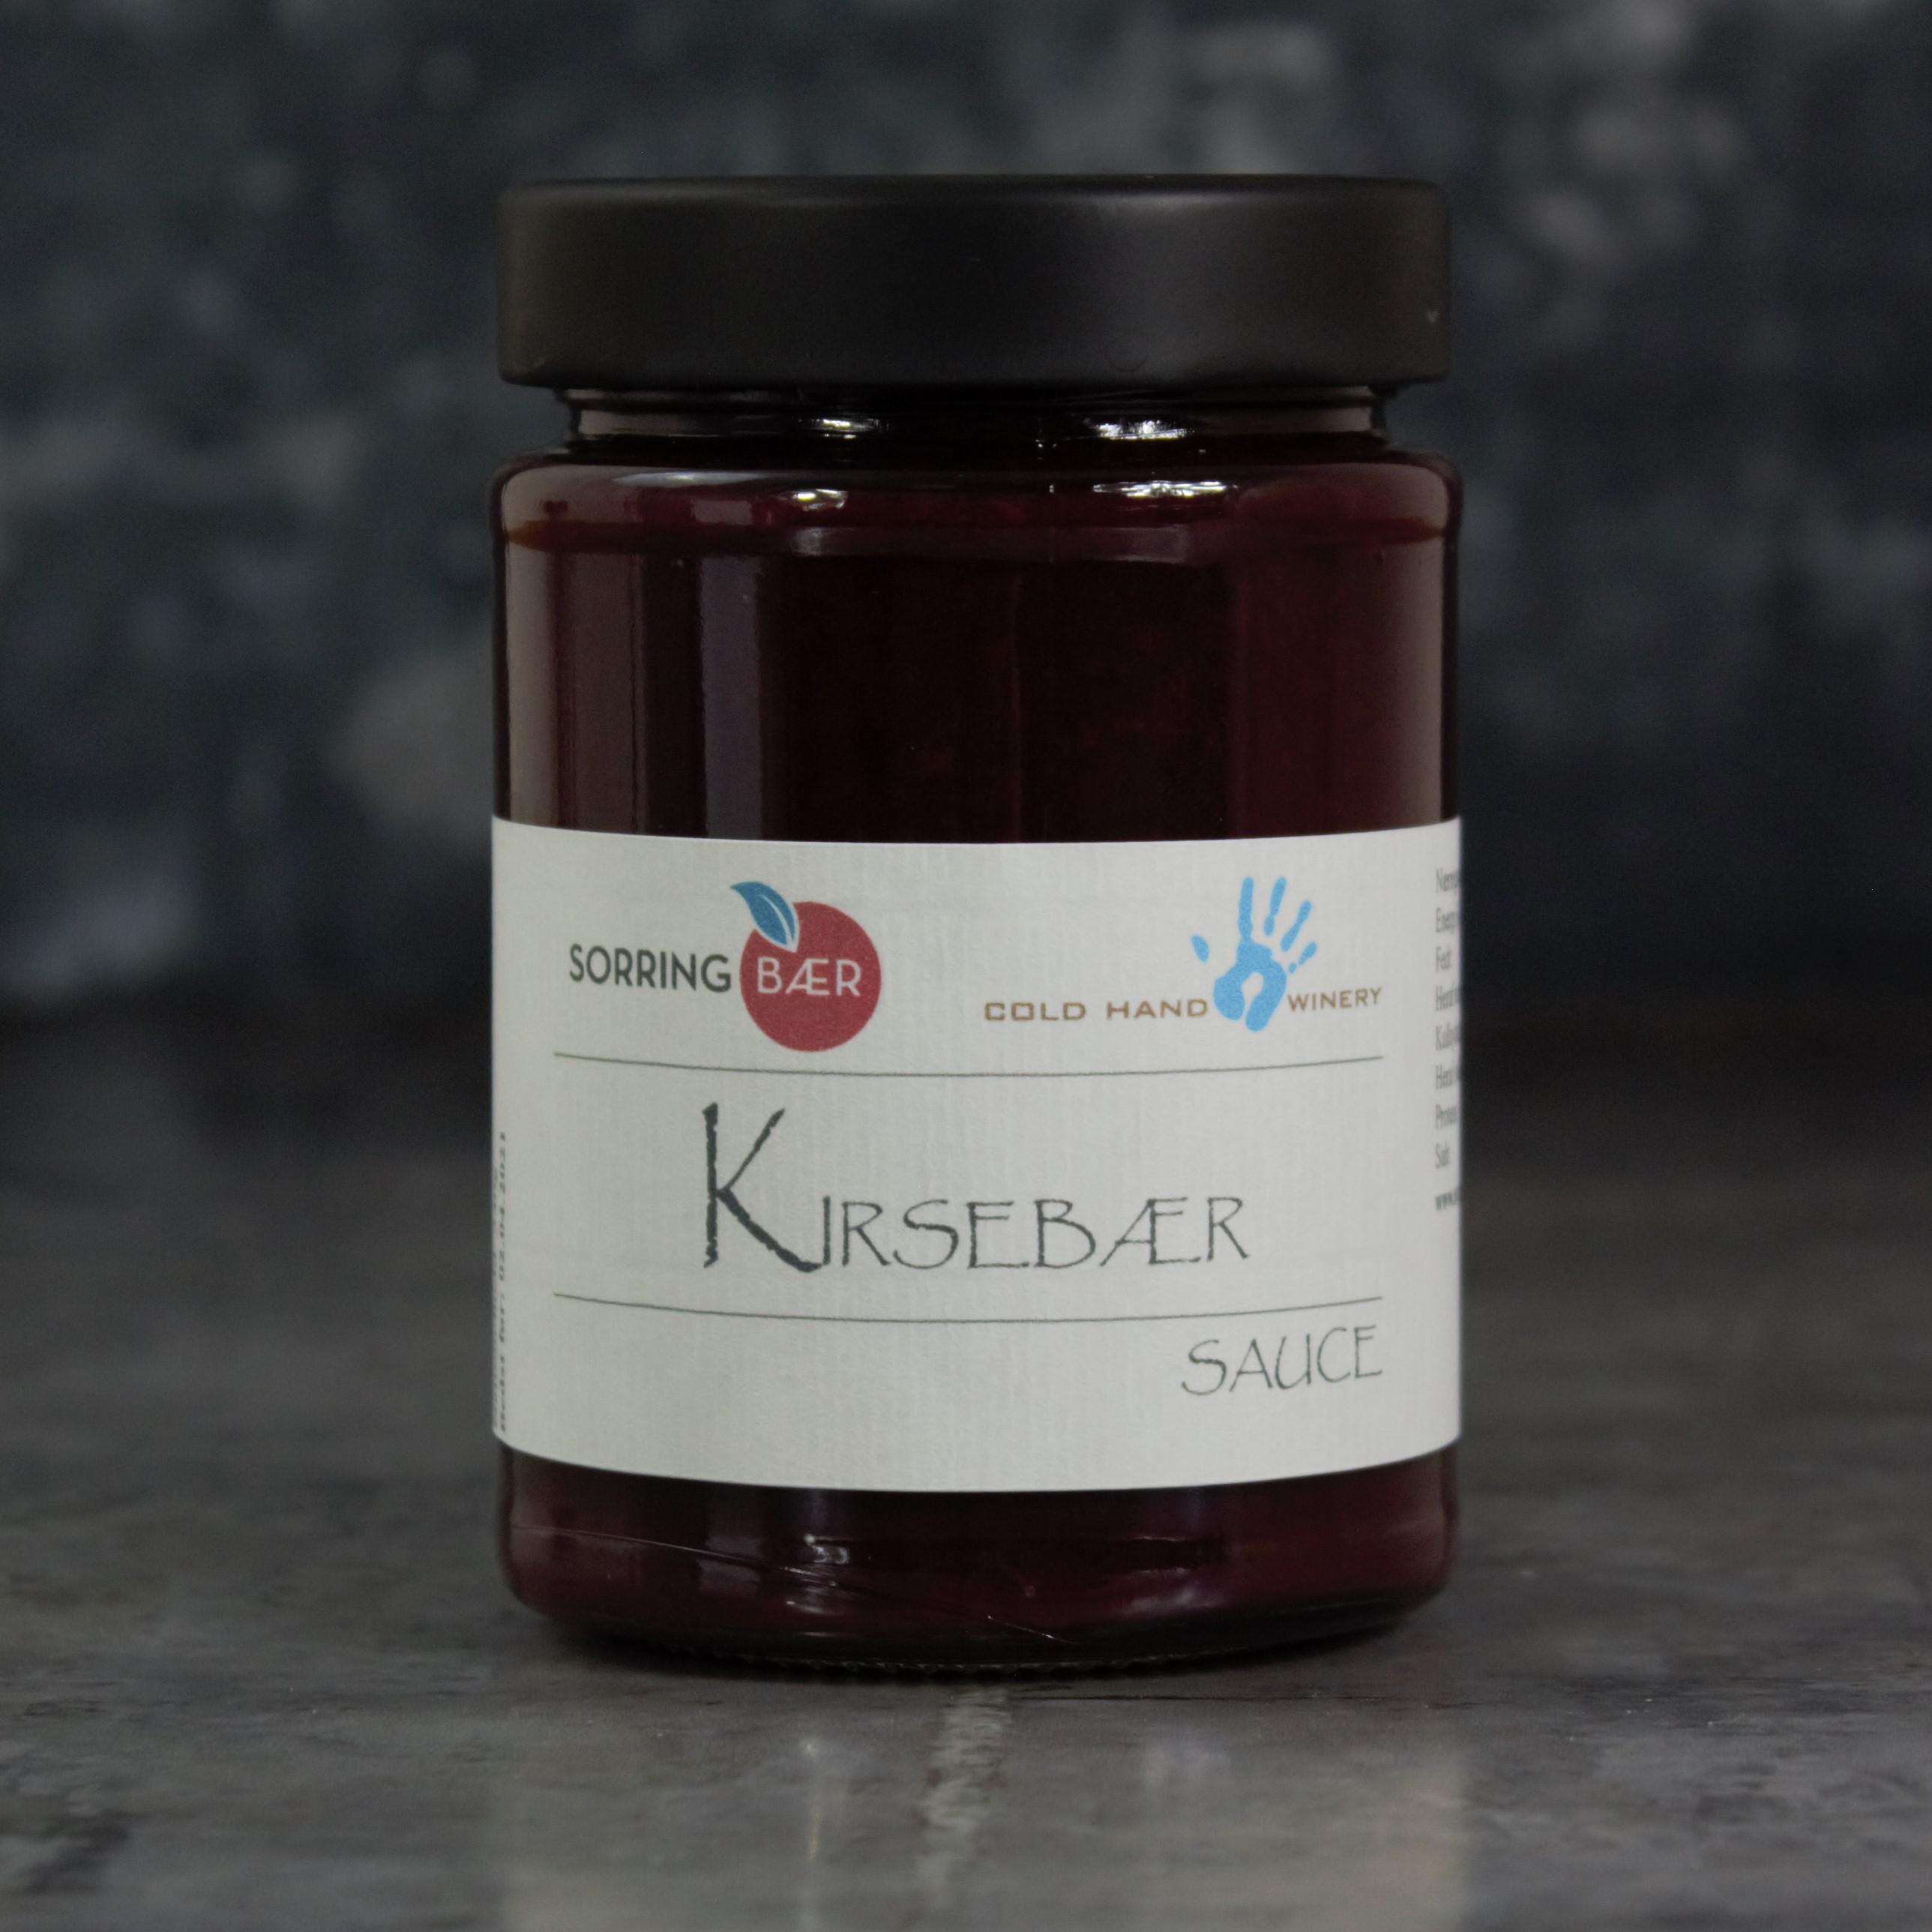 Kirsebærsauce